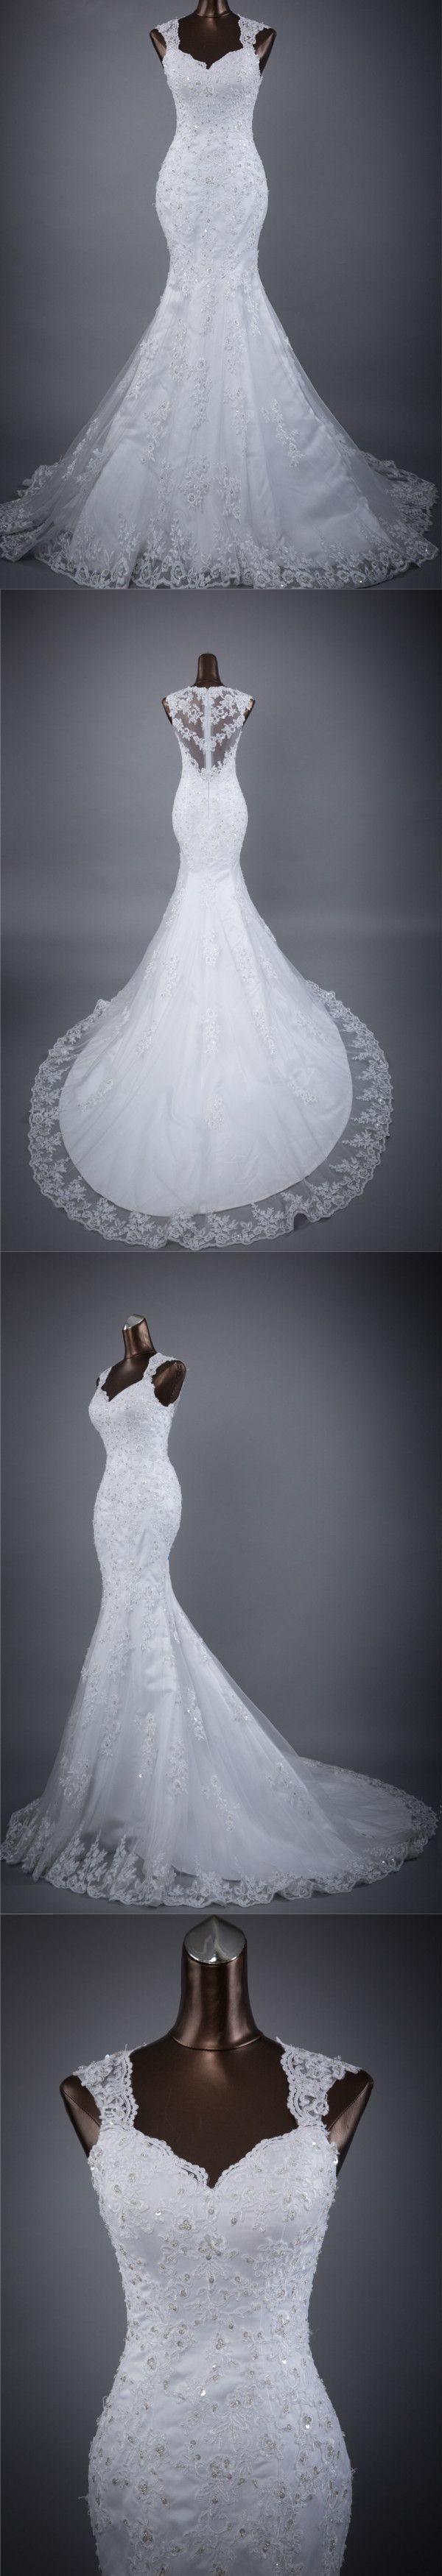 Mermaid Sweetheart Chapel Train Tulle Appliqued Beaded White Wedding Dresses ASD26961 #weddingdresses #mermaid #sweetheart #vintage #princess #white